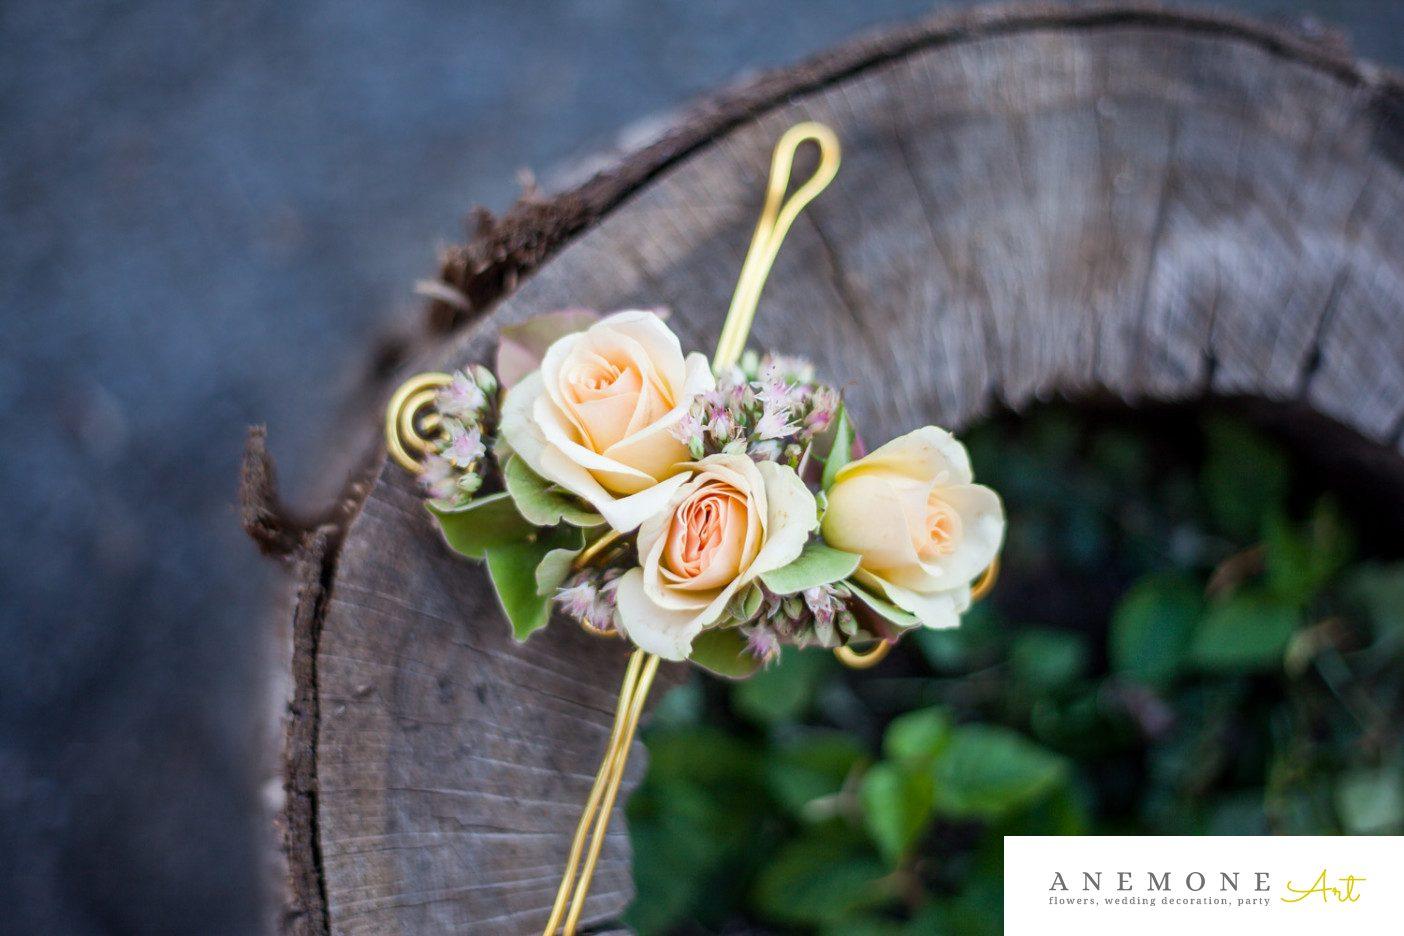 Poza, foto cu Flori de nunta bratara, piersica, trandafiri in Arad, Timisoara, Oradea (wedding flowers, bouquets) nunta Arad, Timisoara, Oradea